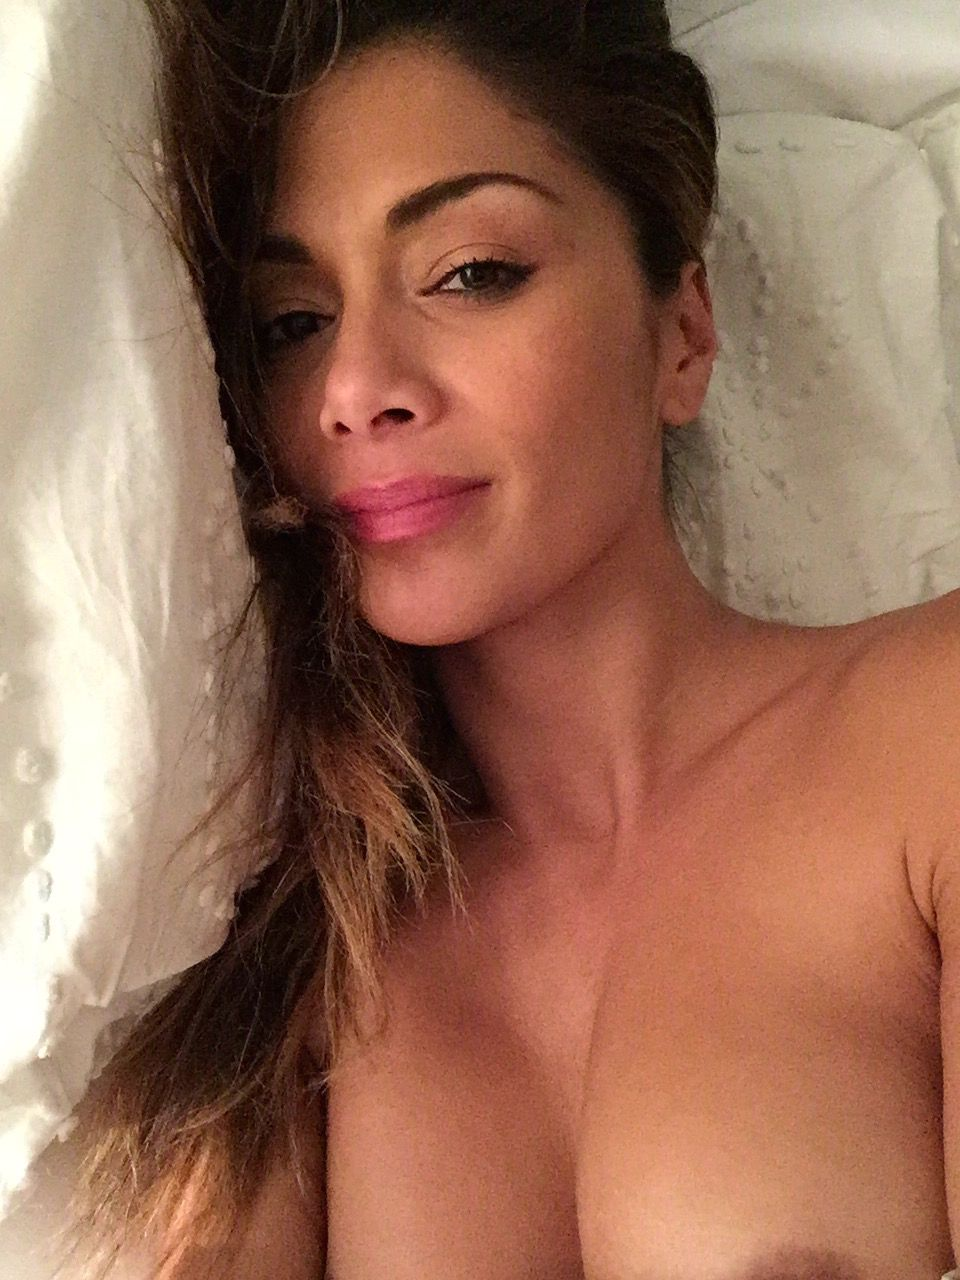 0117151356834_04_Nicole-Scherzinger-Nude-Sexy-TheFappeningBlog.com-4.jpg